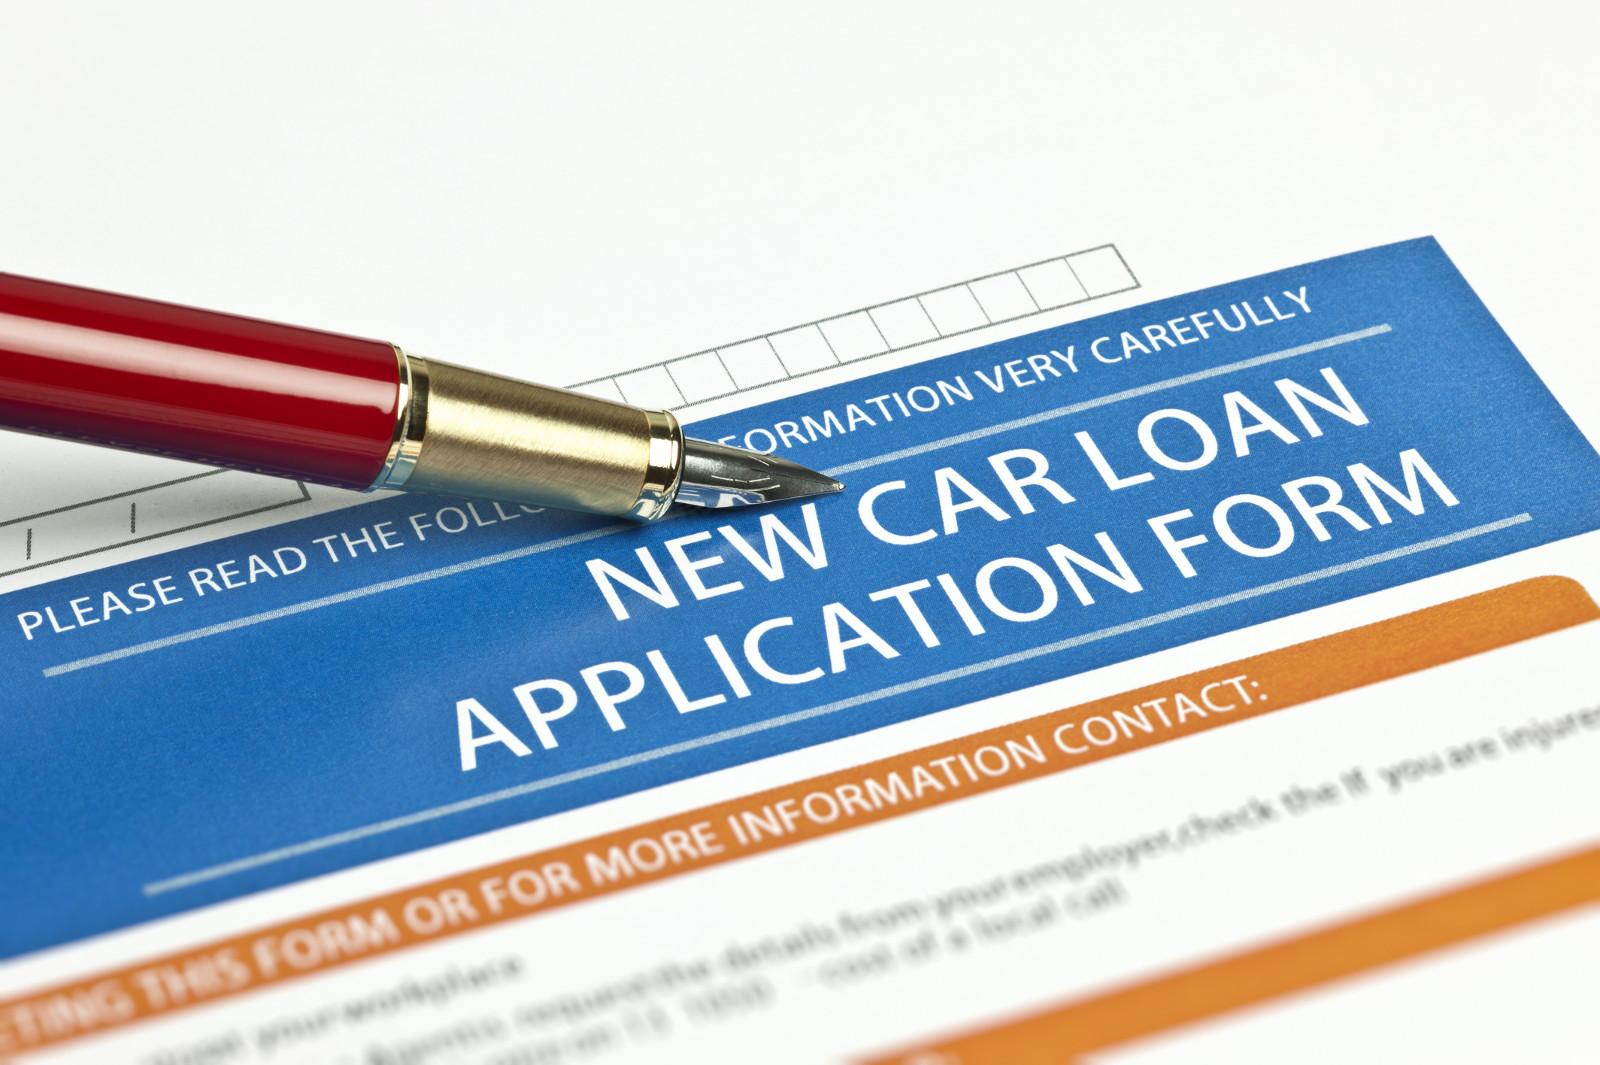 car-loan-application-bad-credit